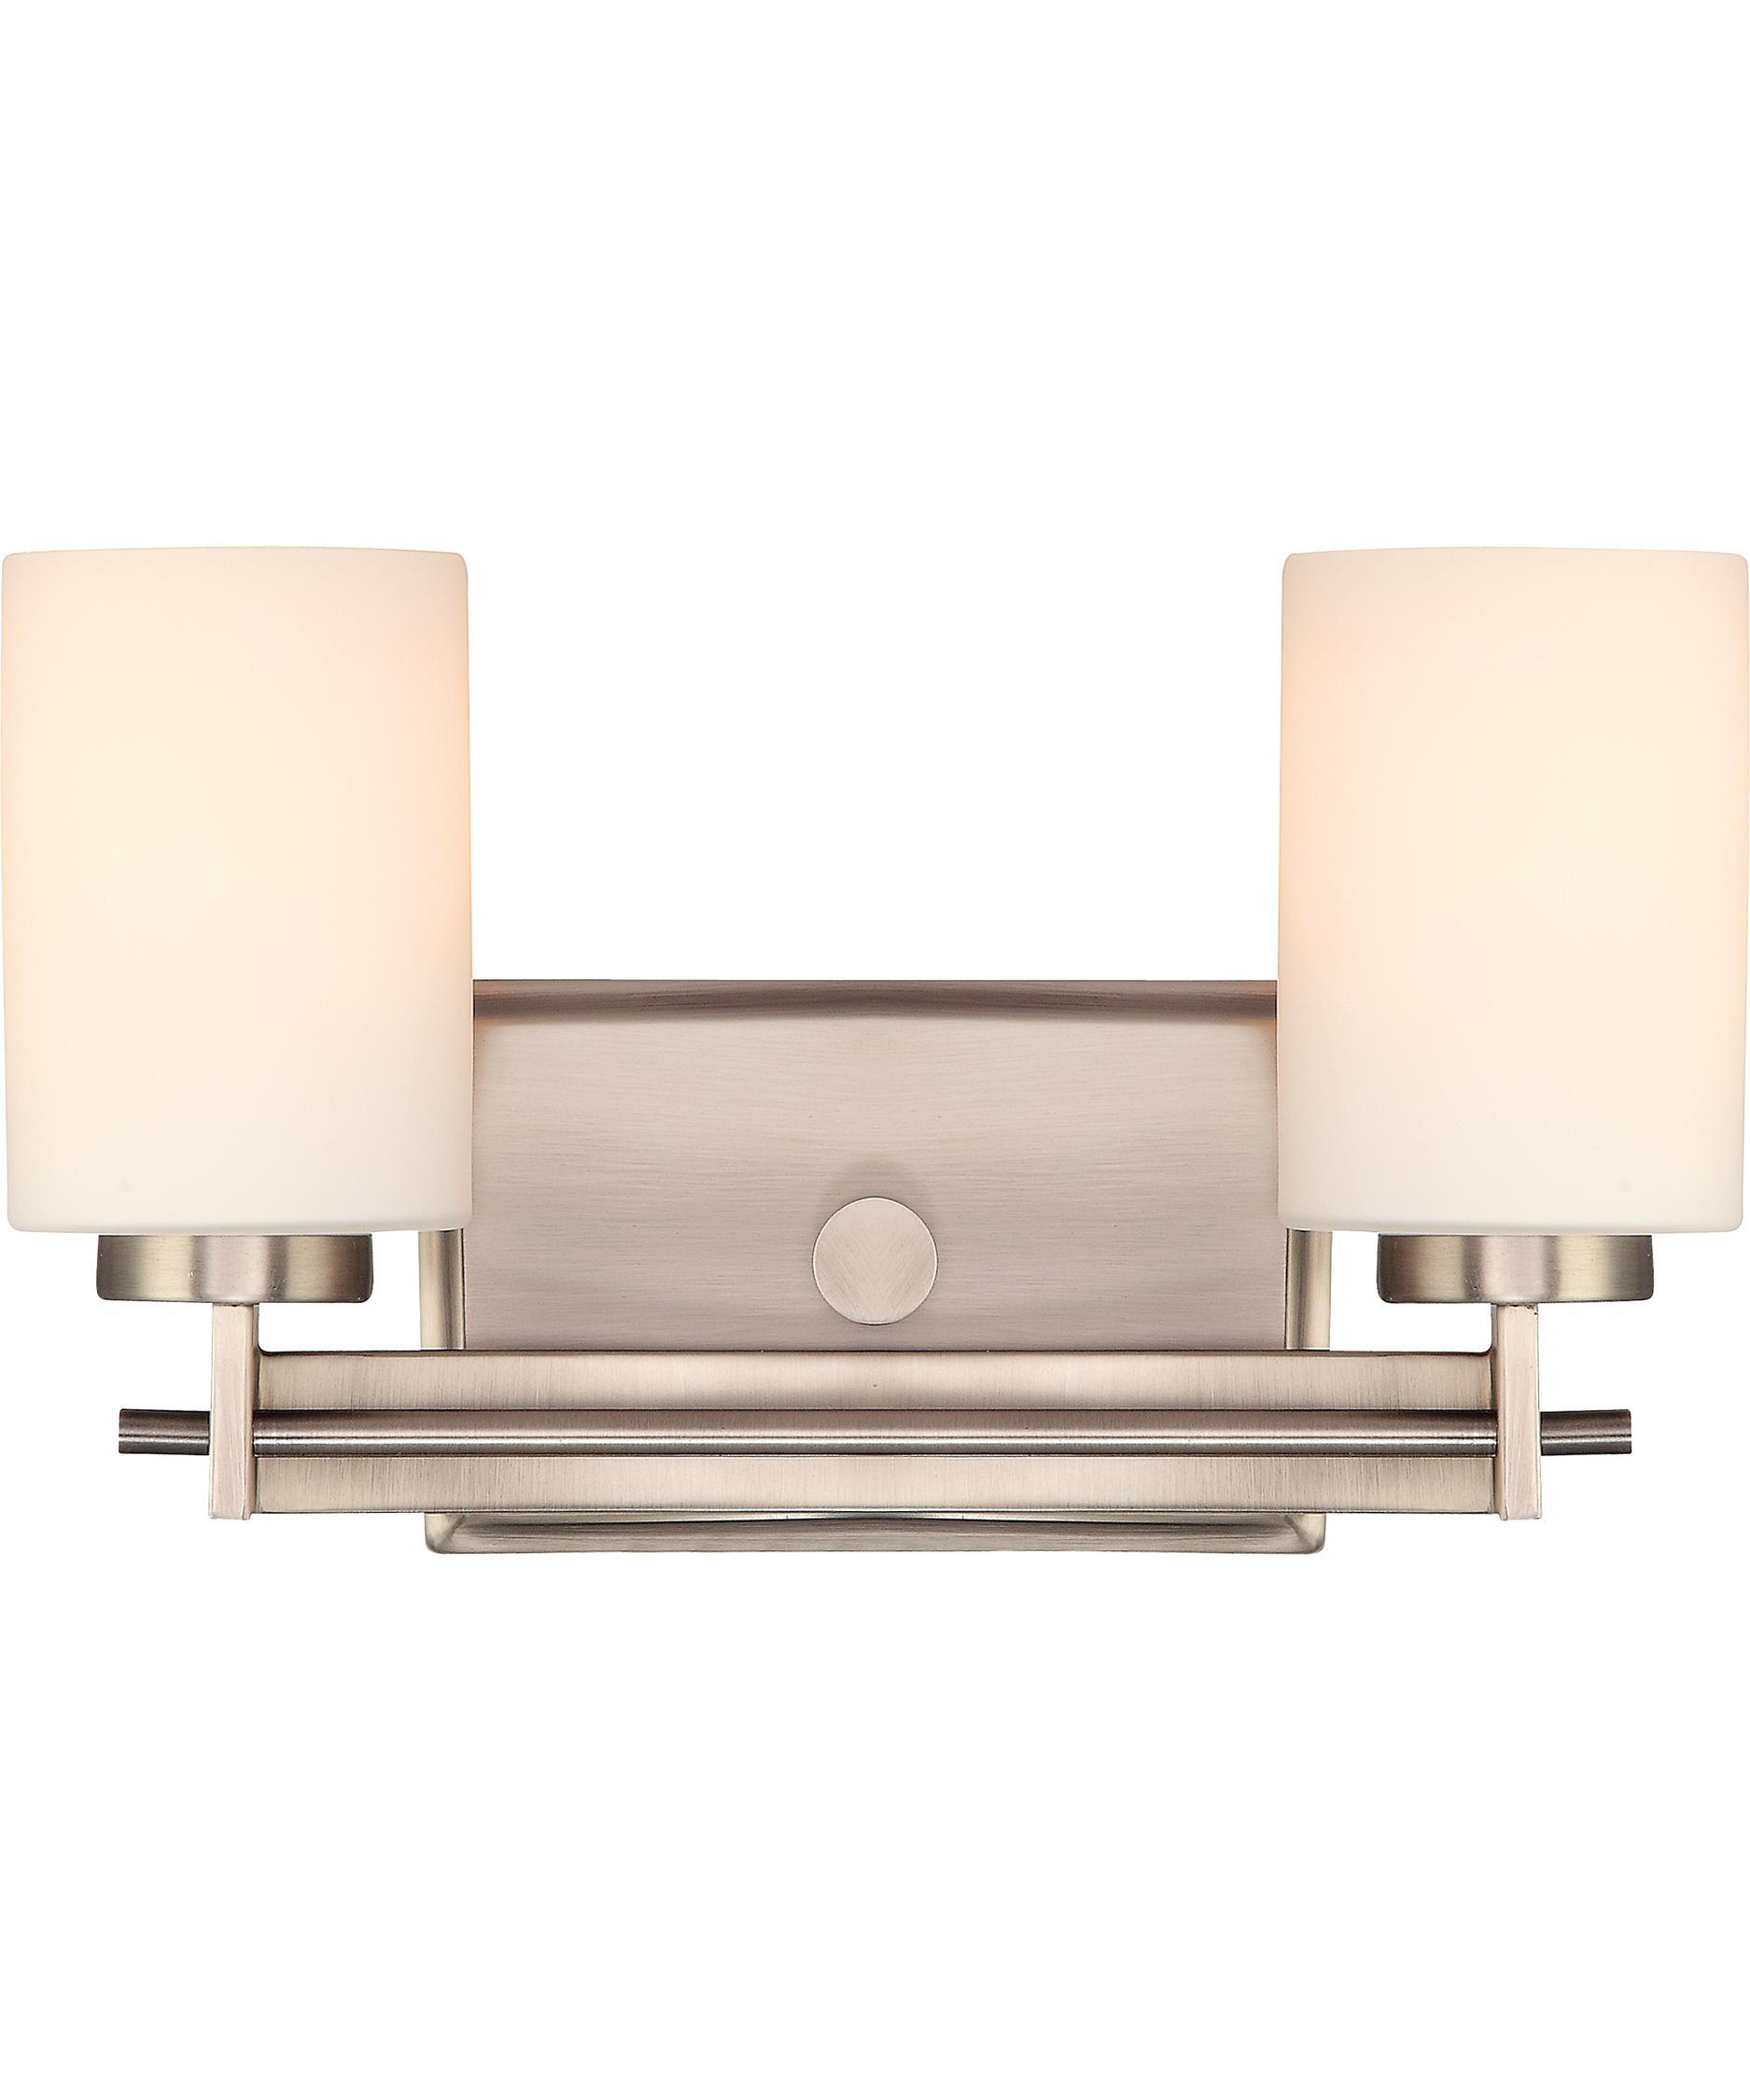 quoizel ty8602 taylor 13 inch wide bath vanity light capitol - Quoizel Bathroom Lighting